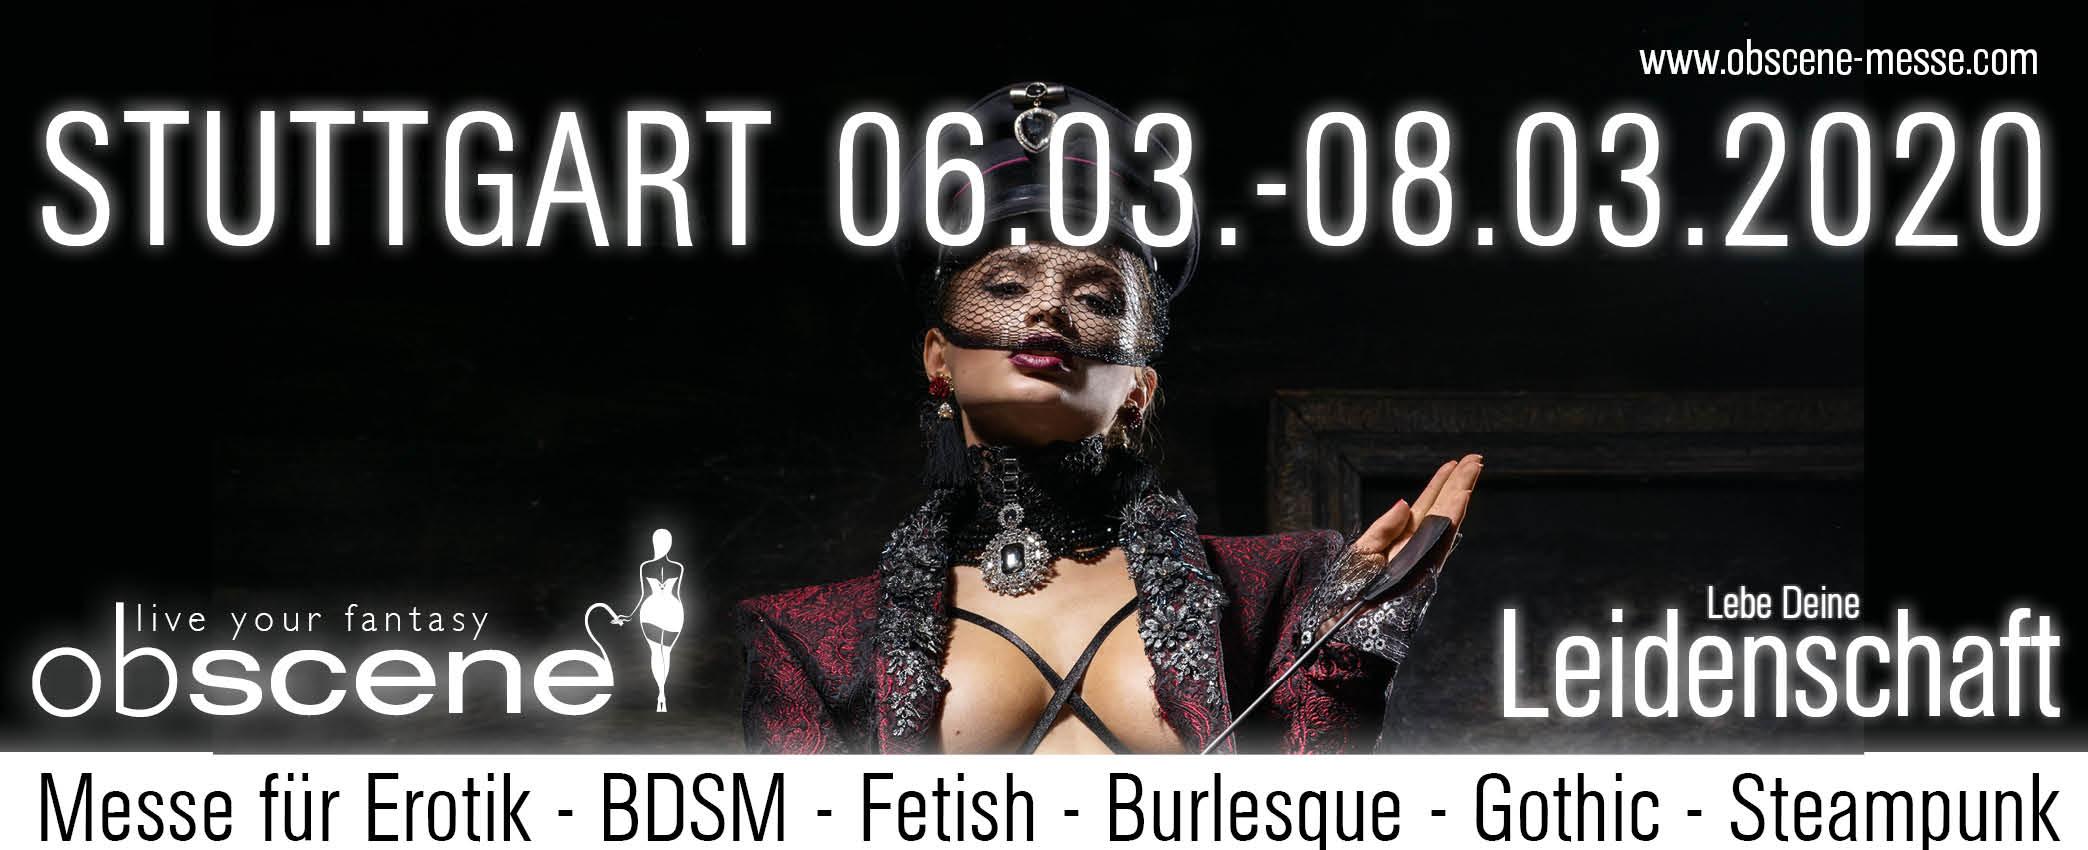 Obscene - Messe